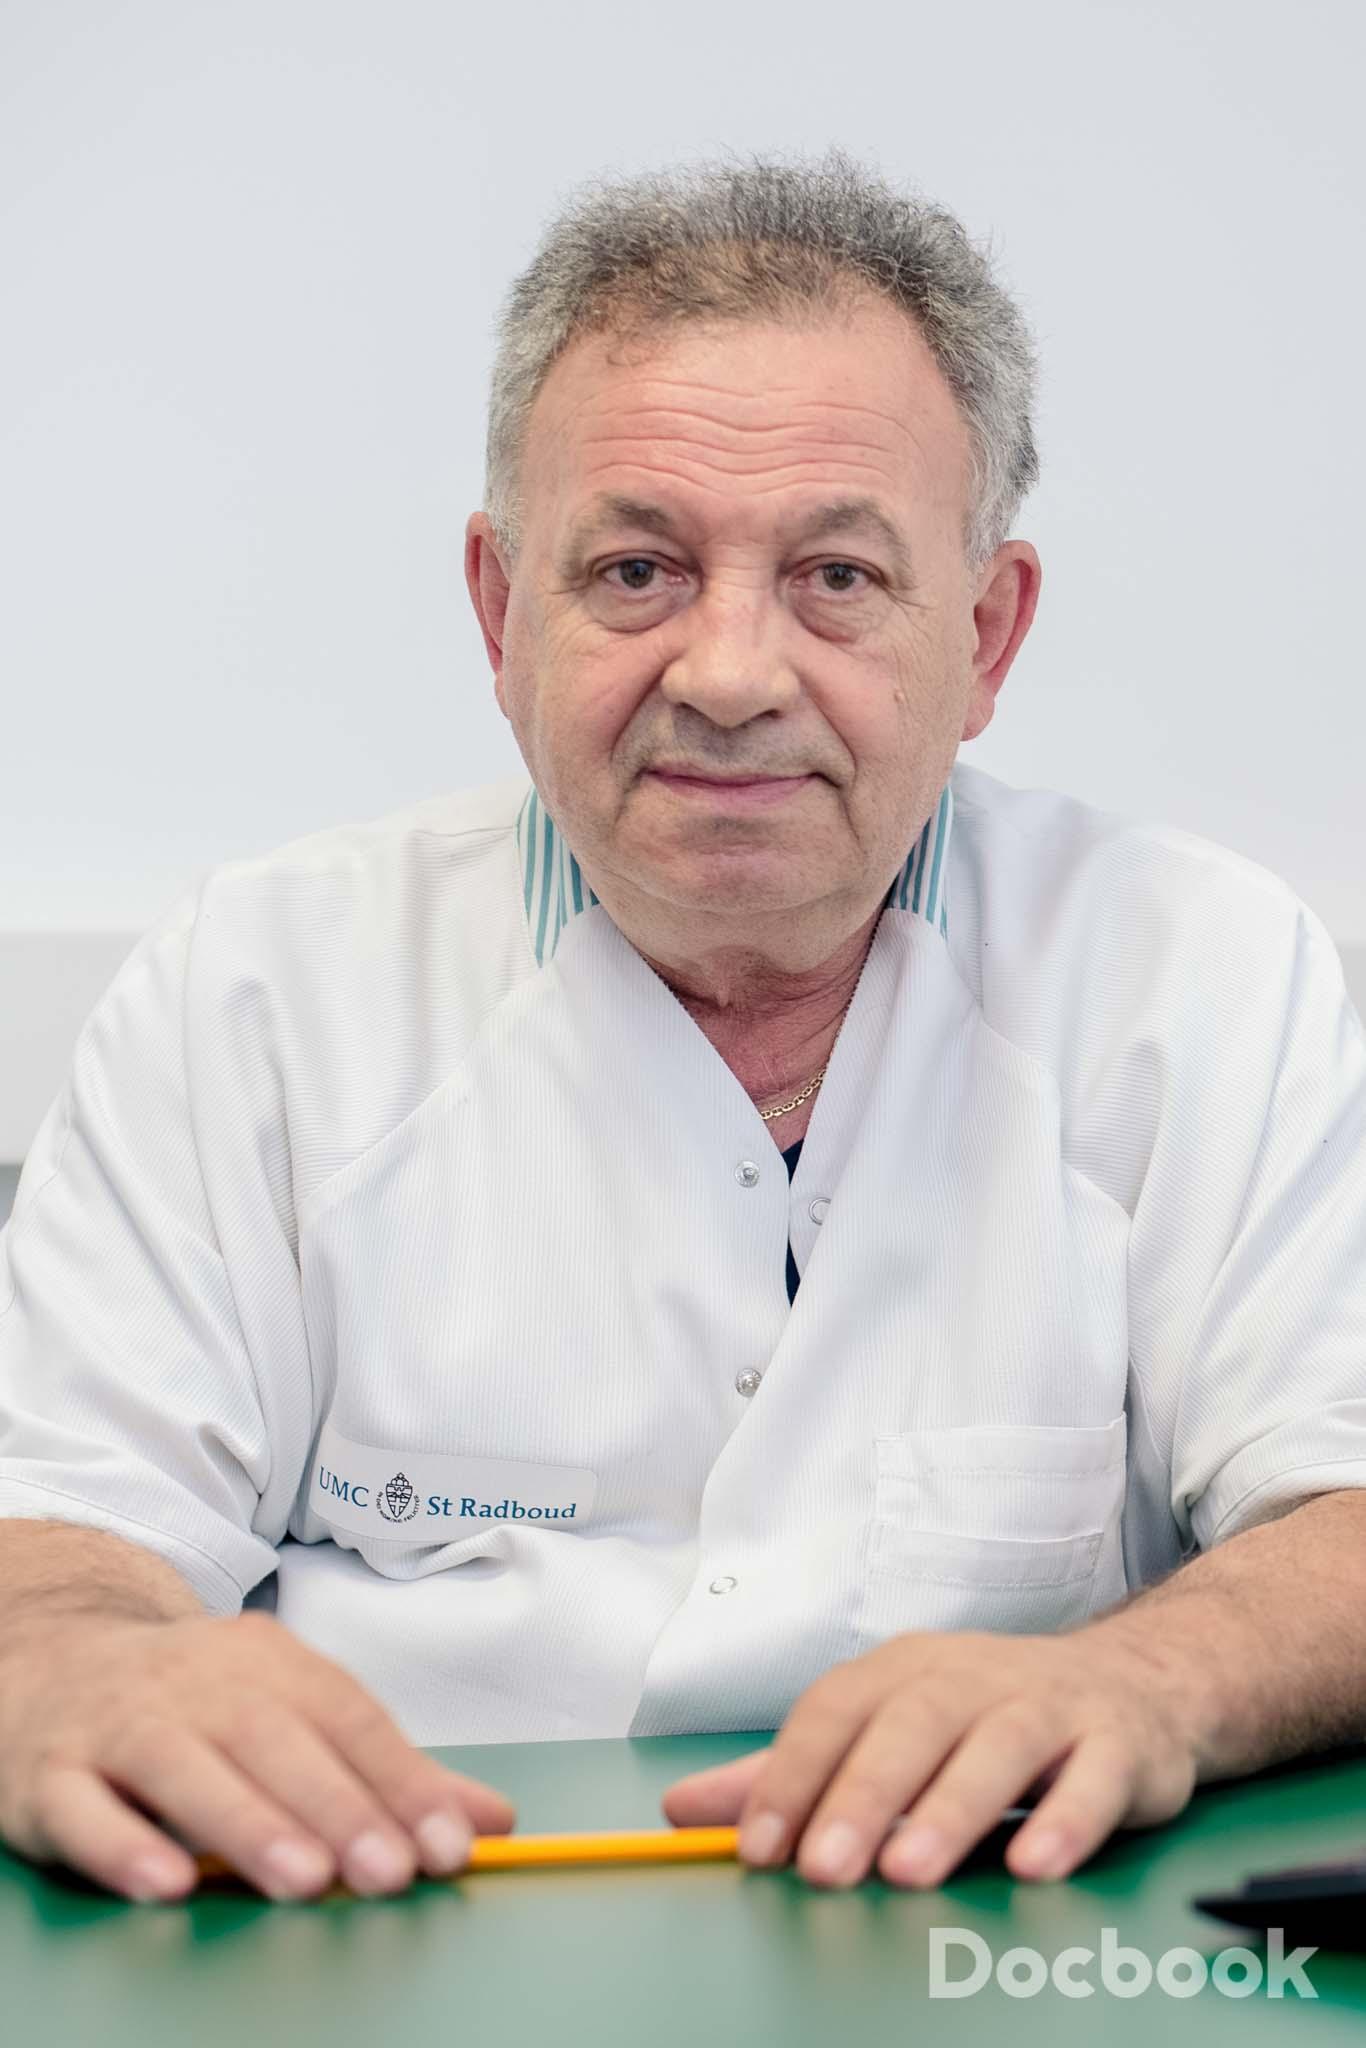 Dr. Gheorghe Bozdog